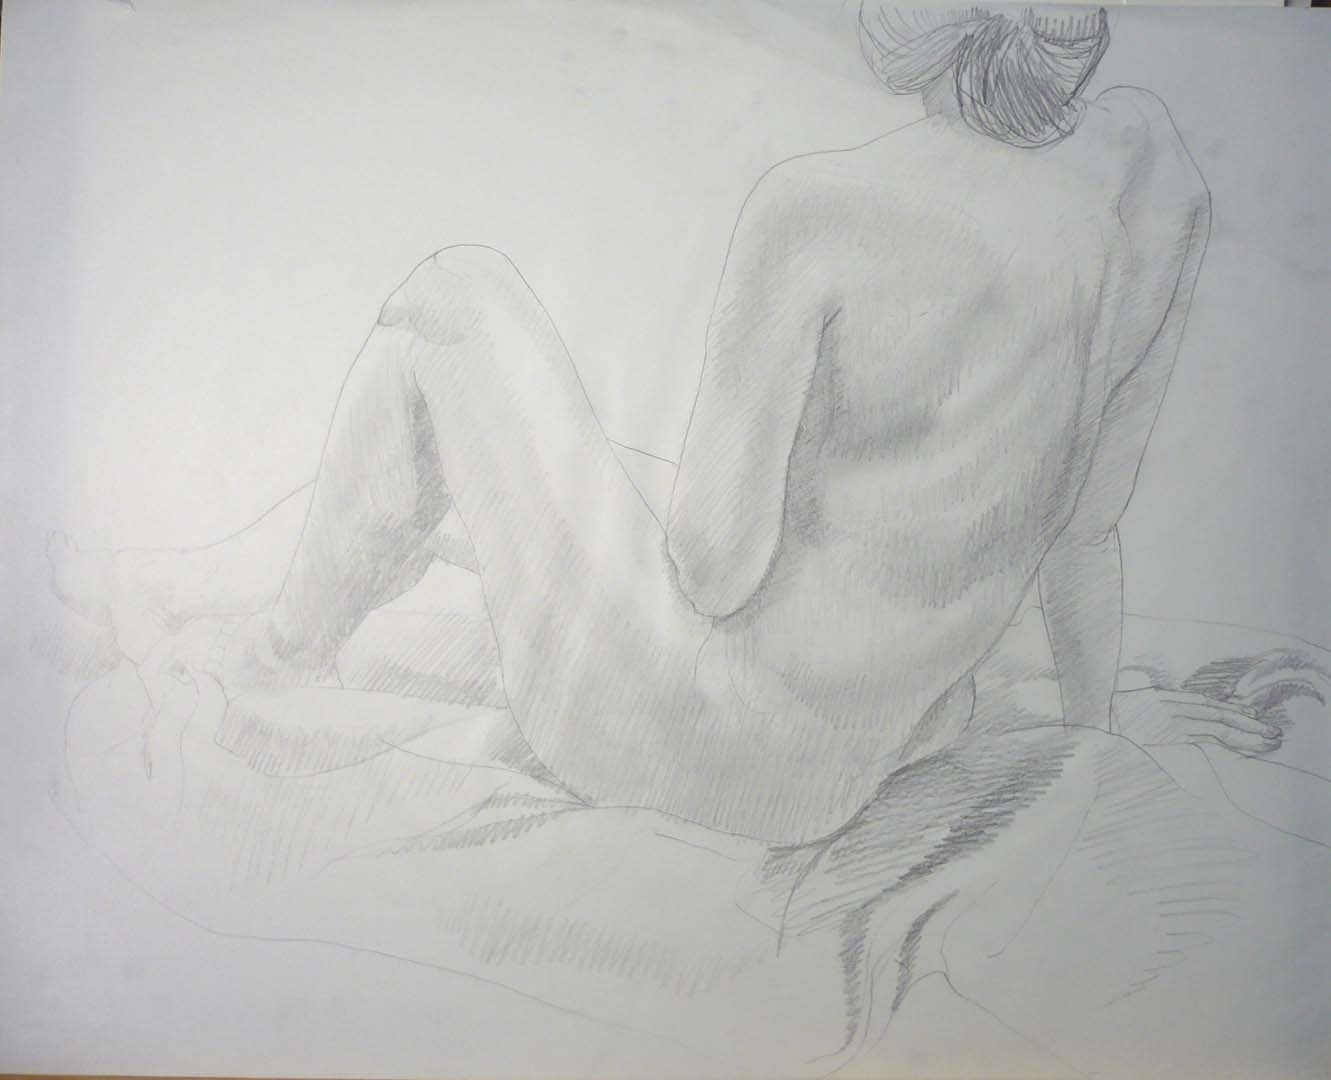 Leaning Female Leg Raised Pencil 23 x 29